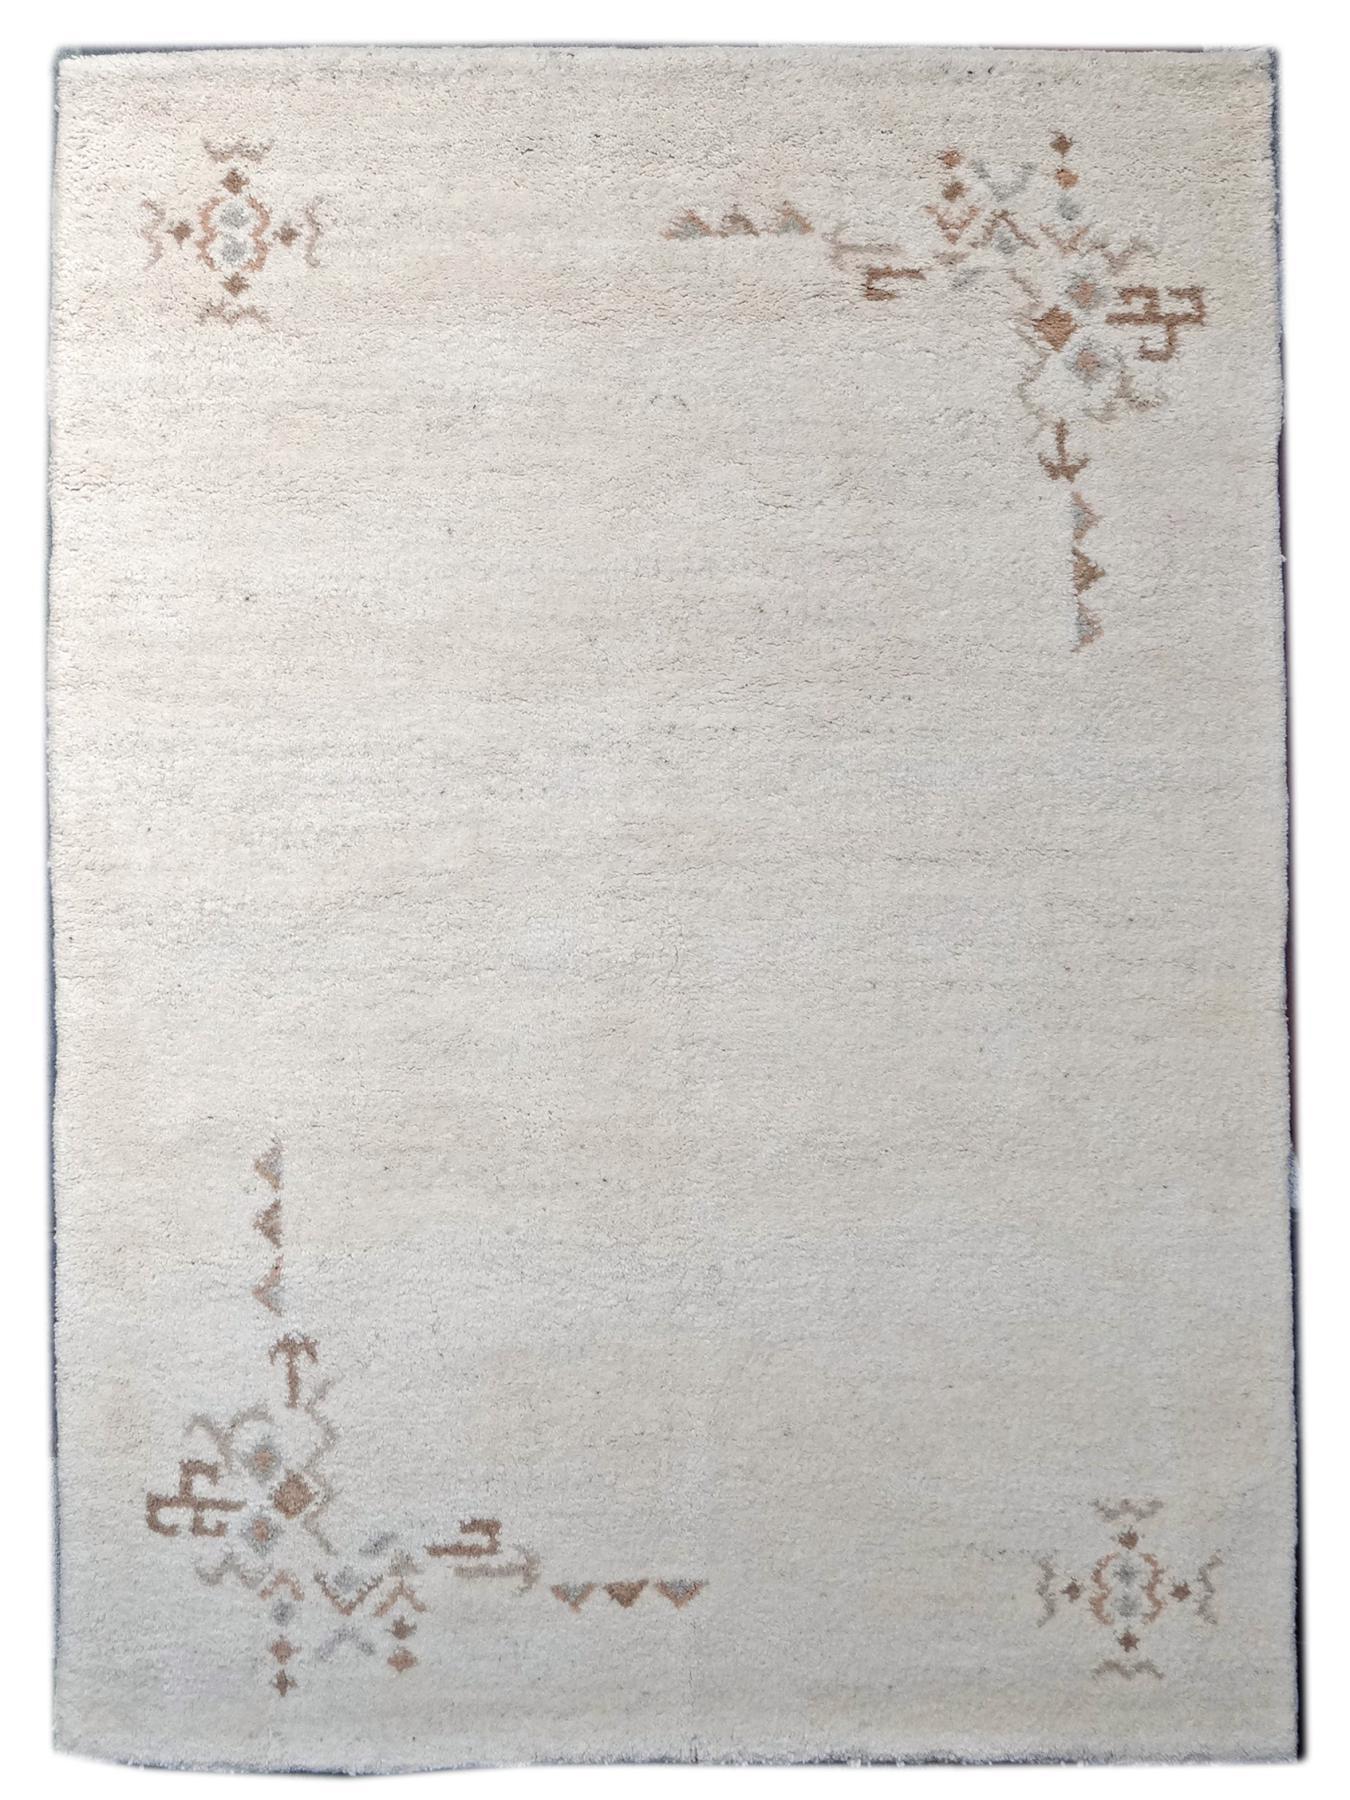 Berber rugs - ATLAS 2 - 118